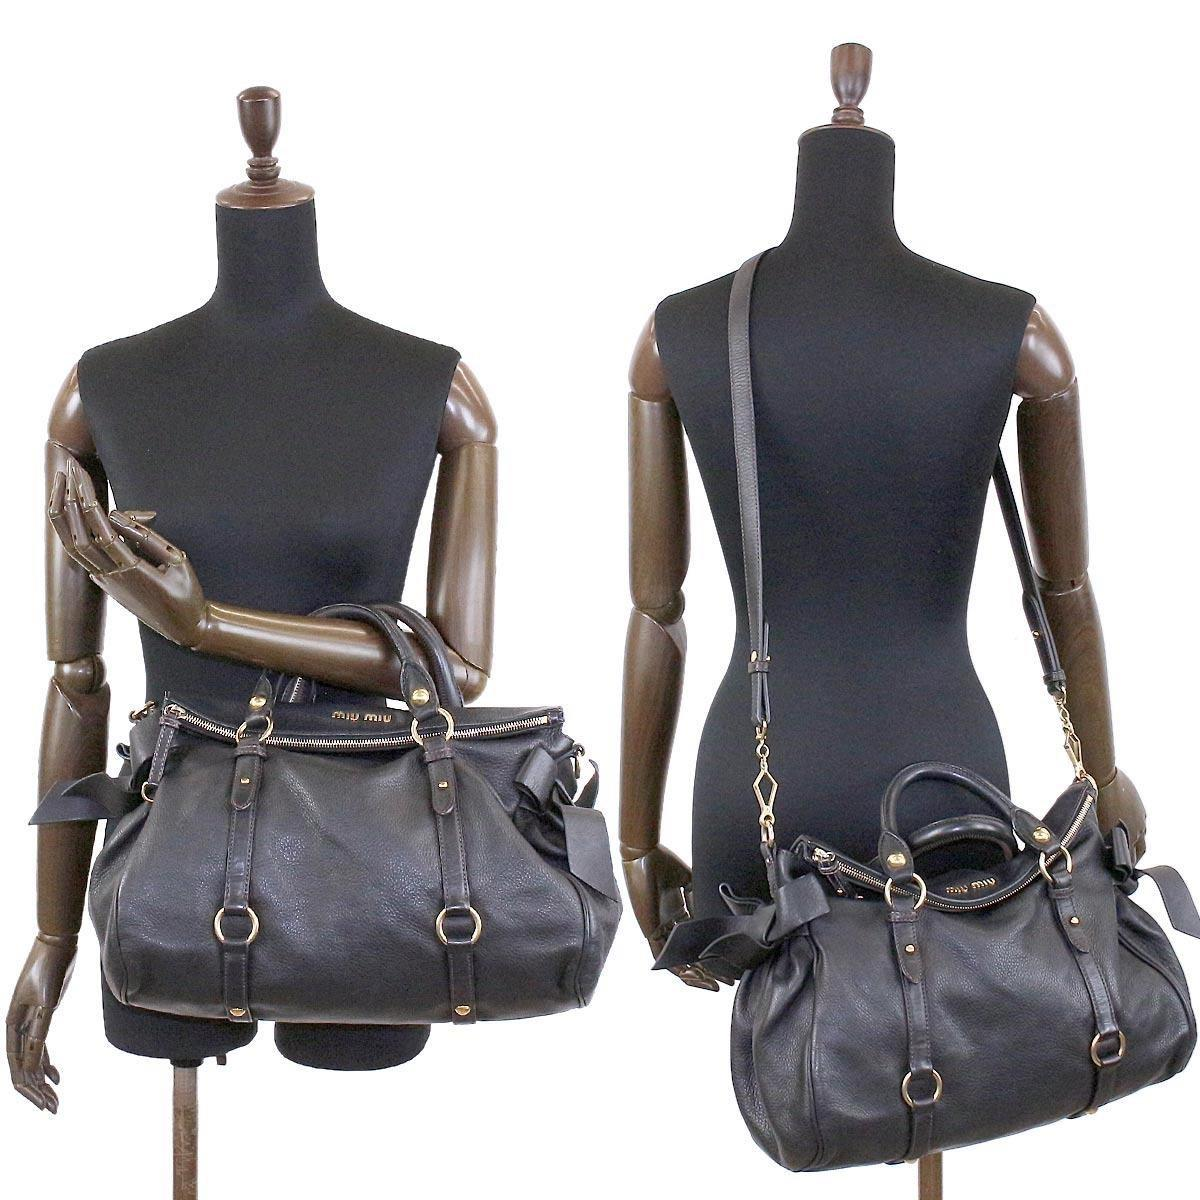 2b7d1494631 Gallery. Previously sold at  Reebonz · Women s Box Bags Women s Miu Miu  Shoulder ...